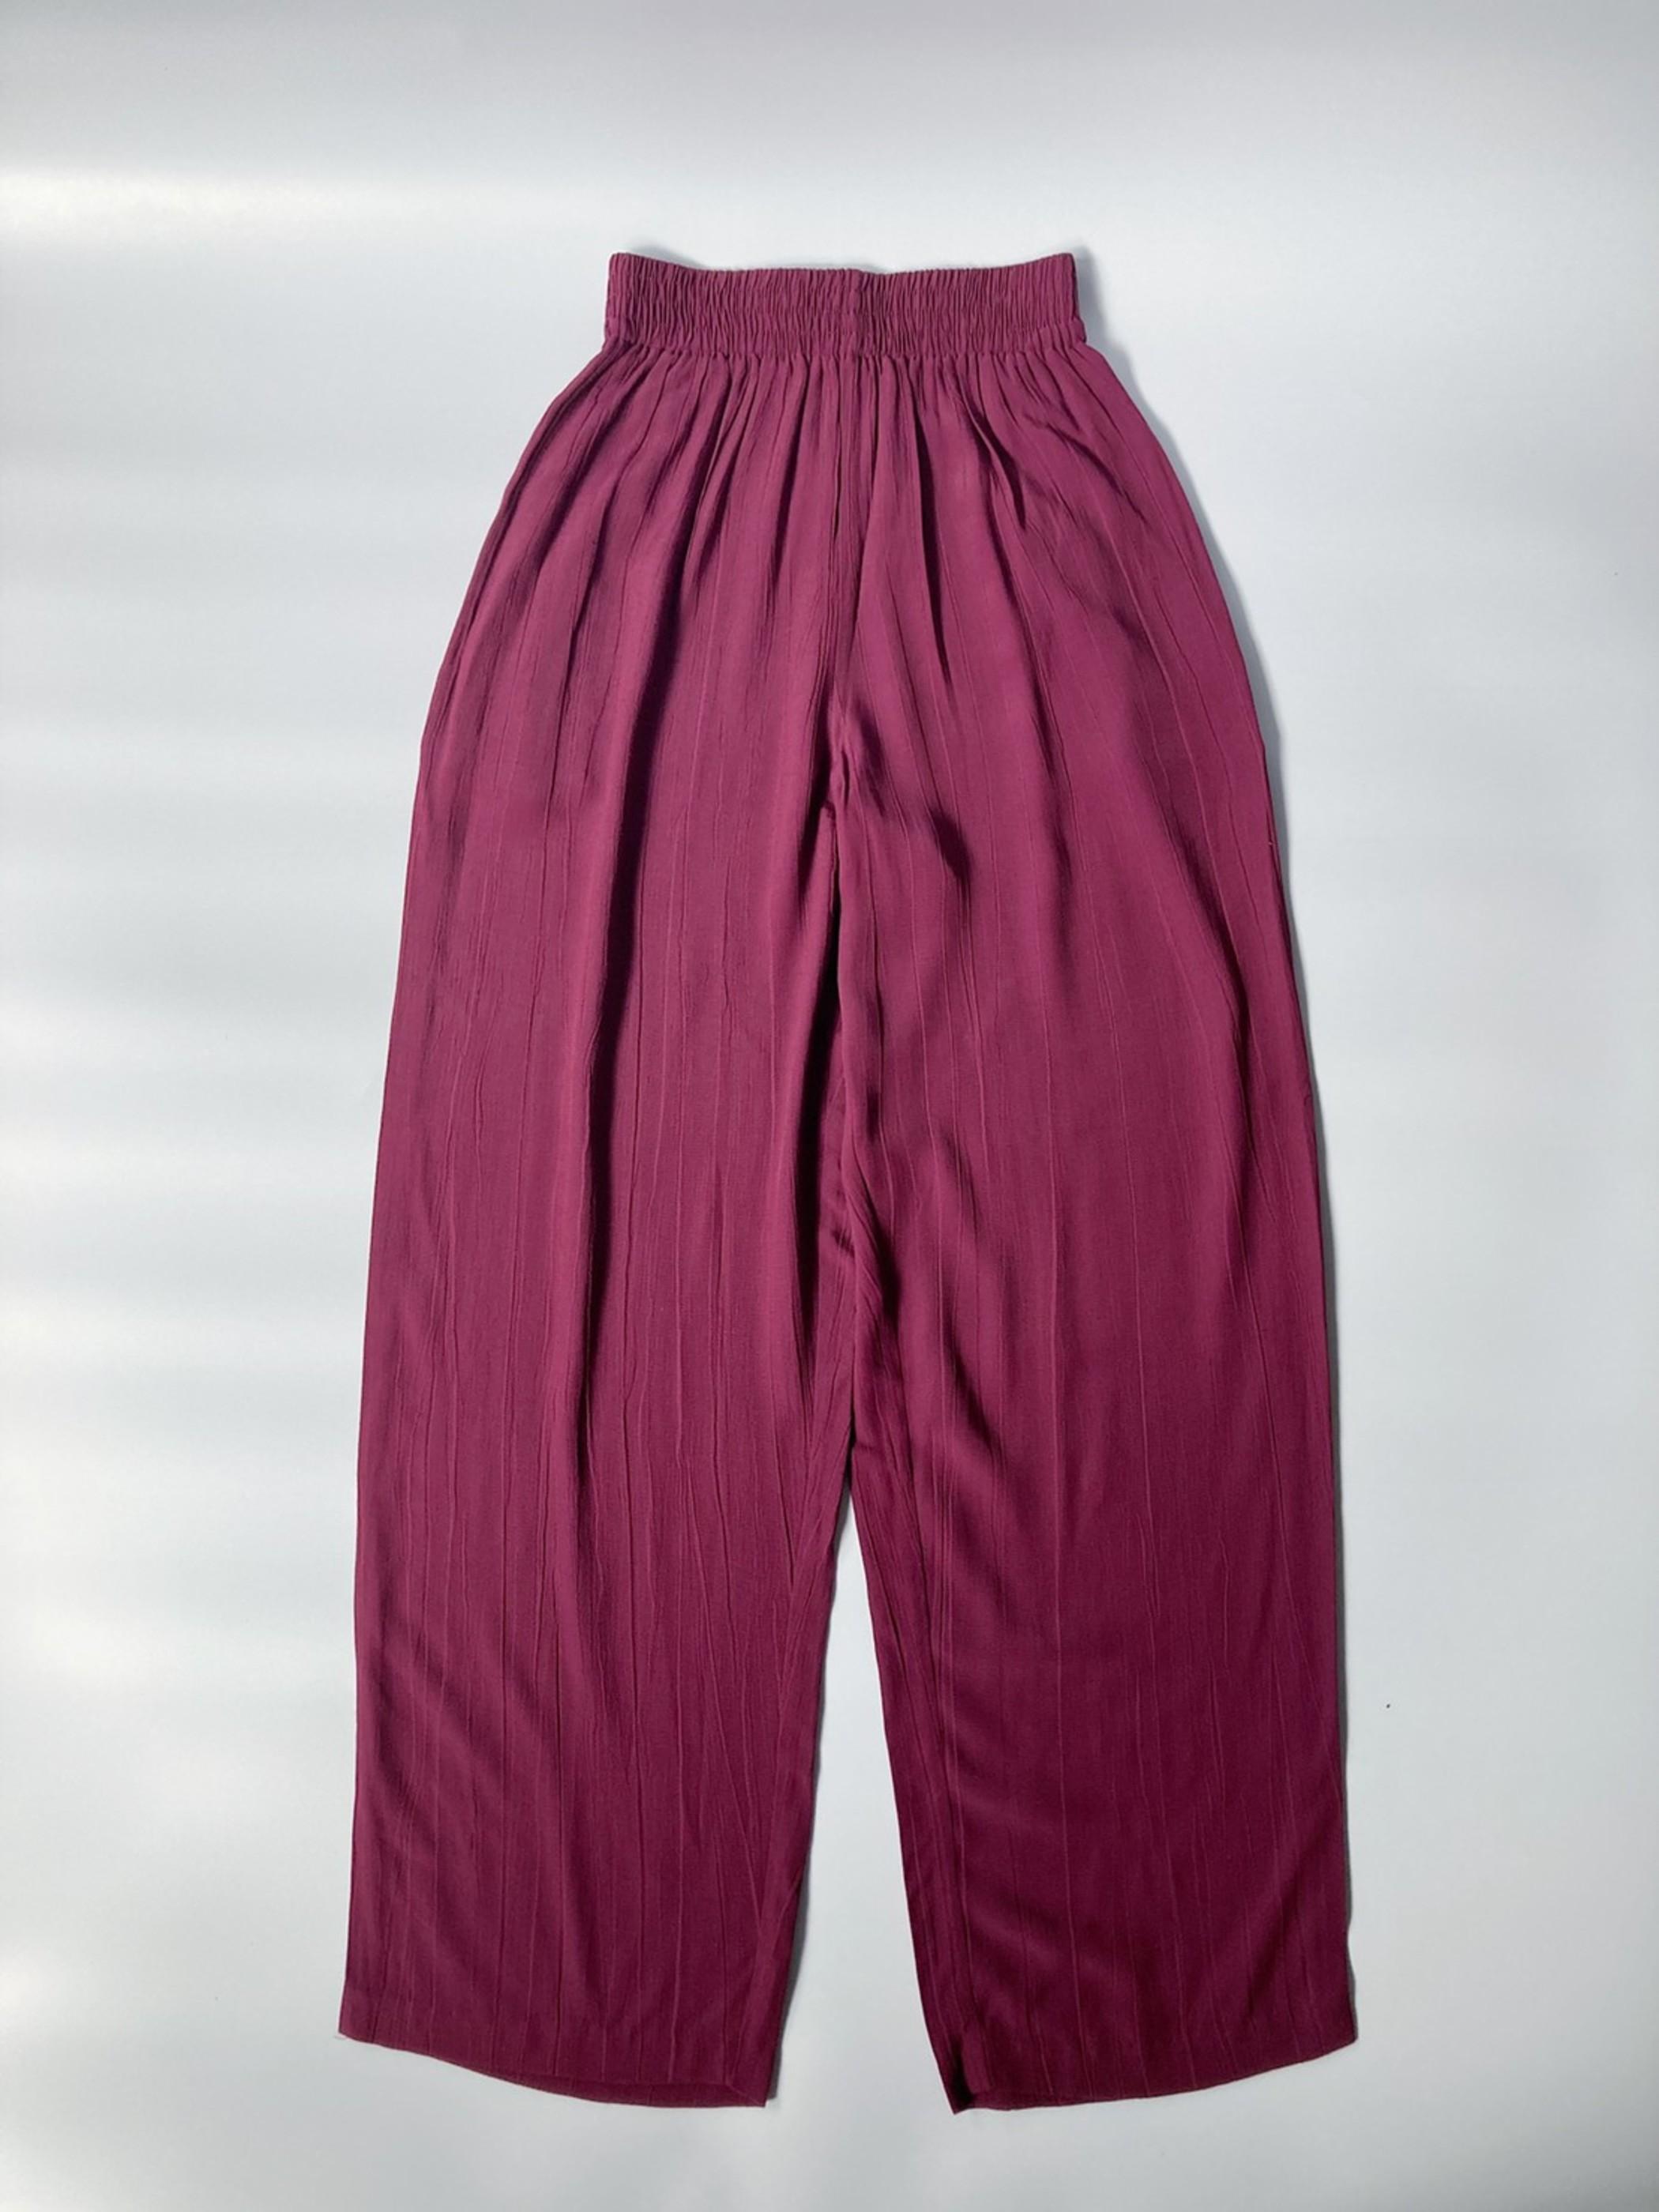 relax rayon pants